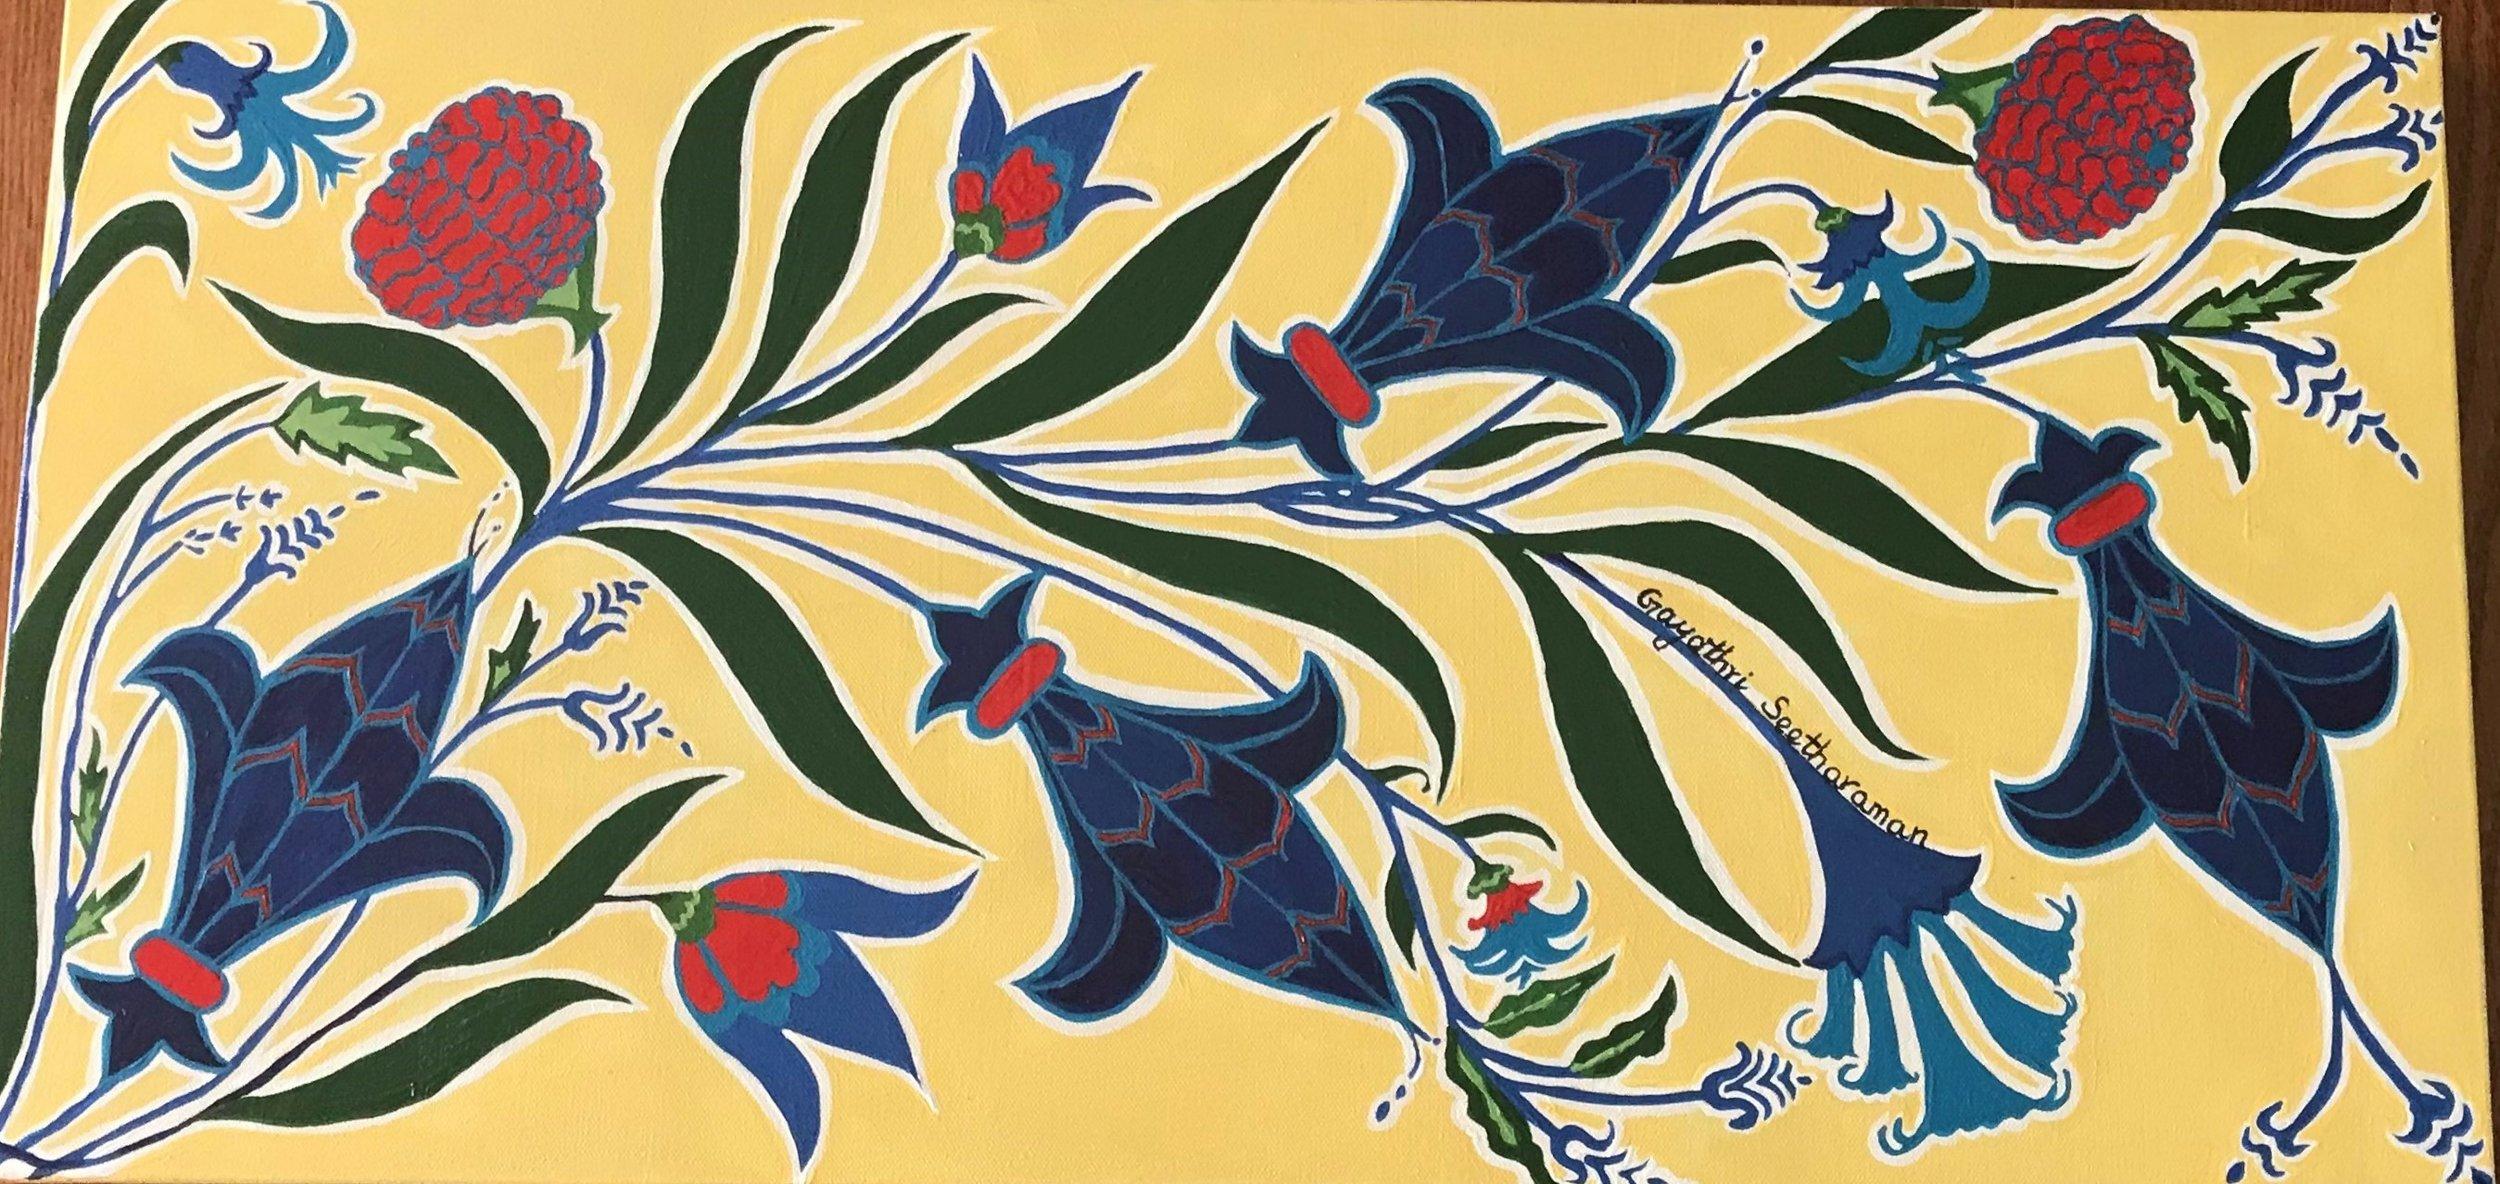 Turkish Tile in Fleur-de-lis, Gayathri Seetharaman